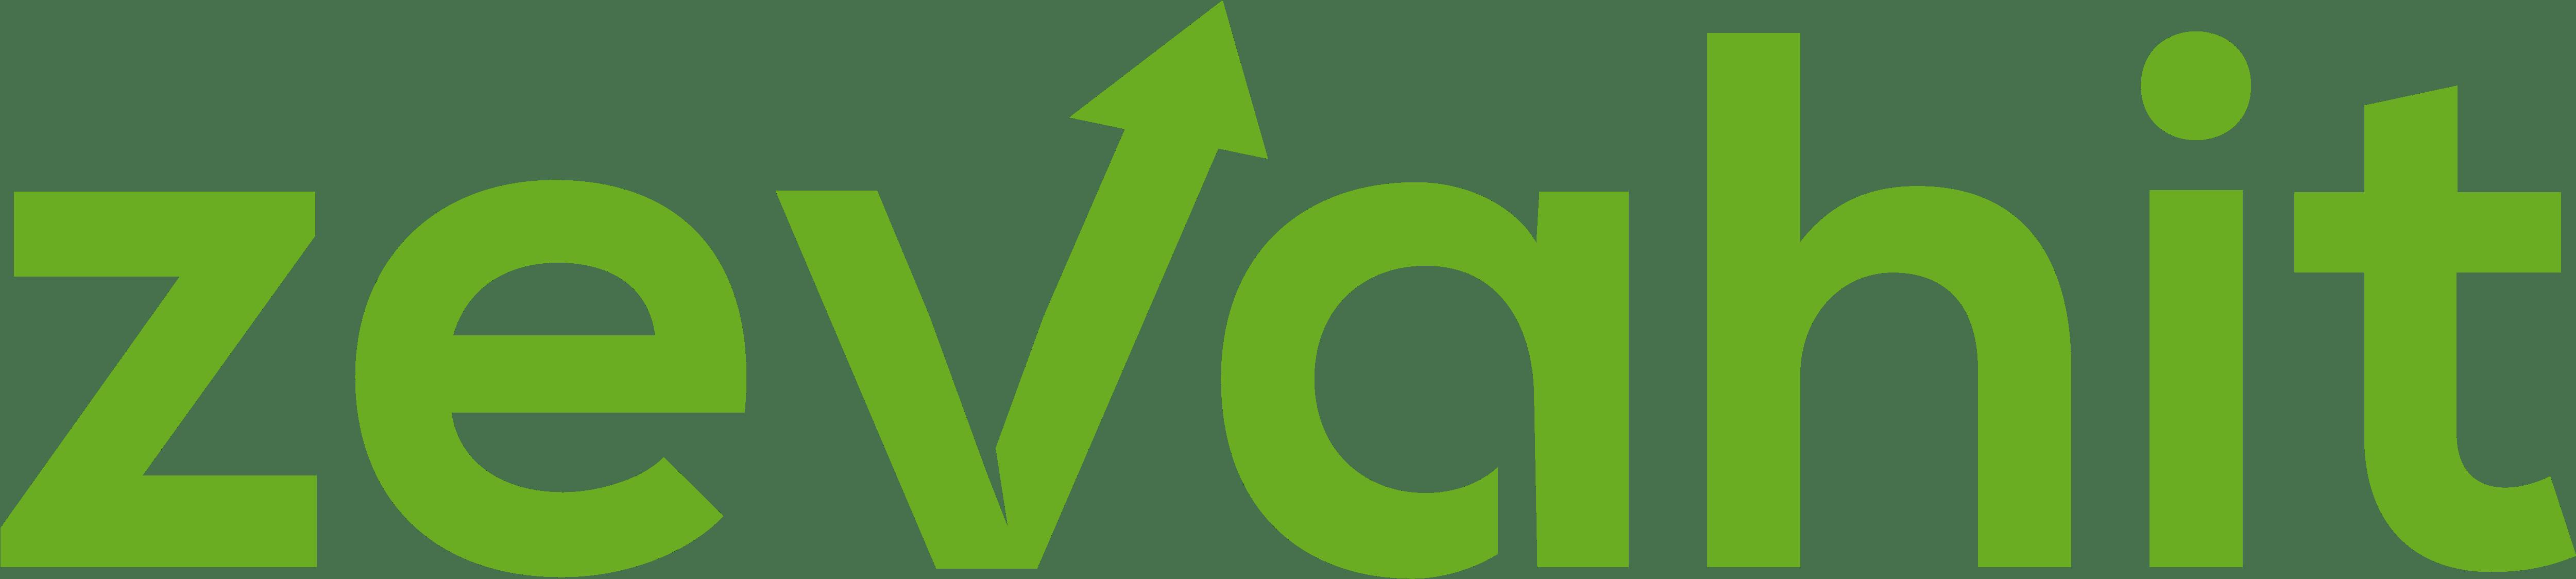 Zevahit Logo